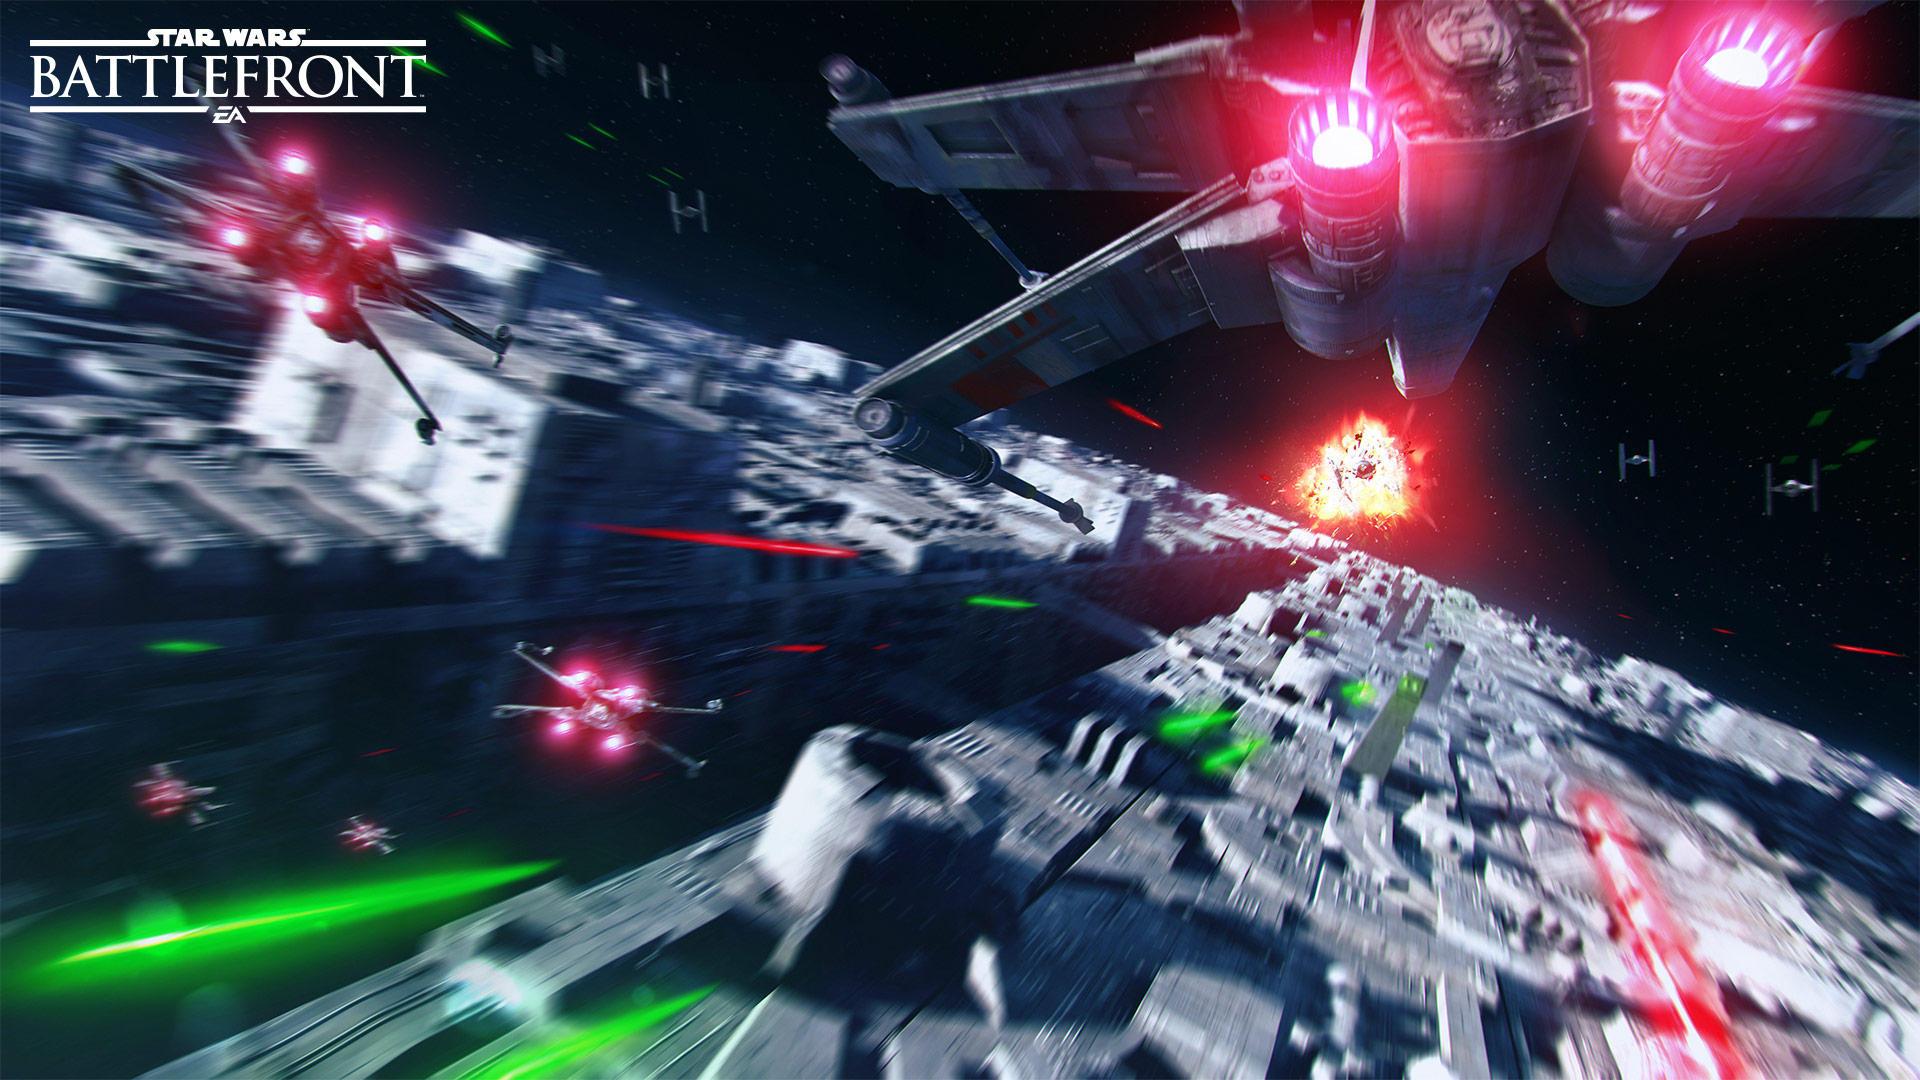 Music Respawn Gordy Haab Composes B Side Tracks For Star Wars Battlefront Wshu